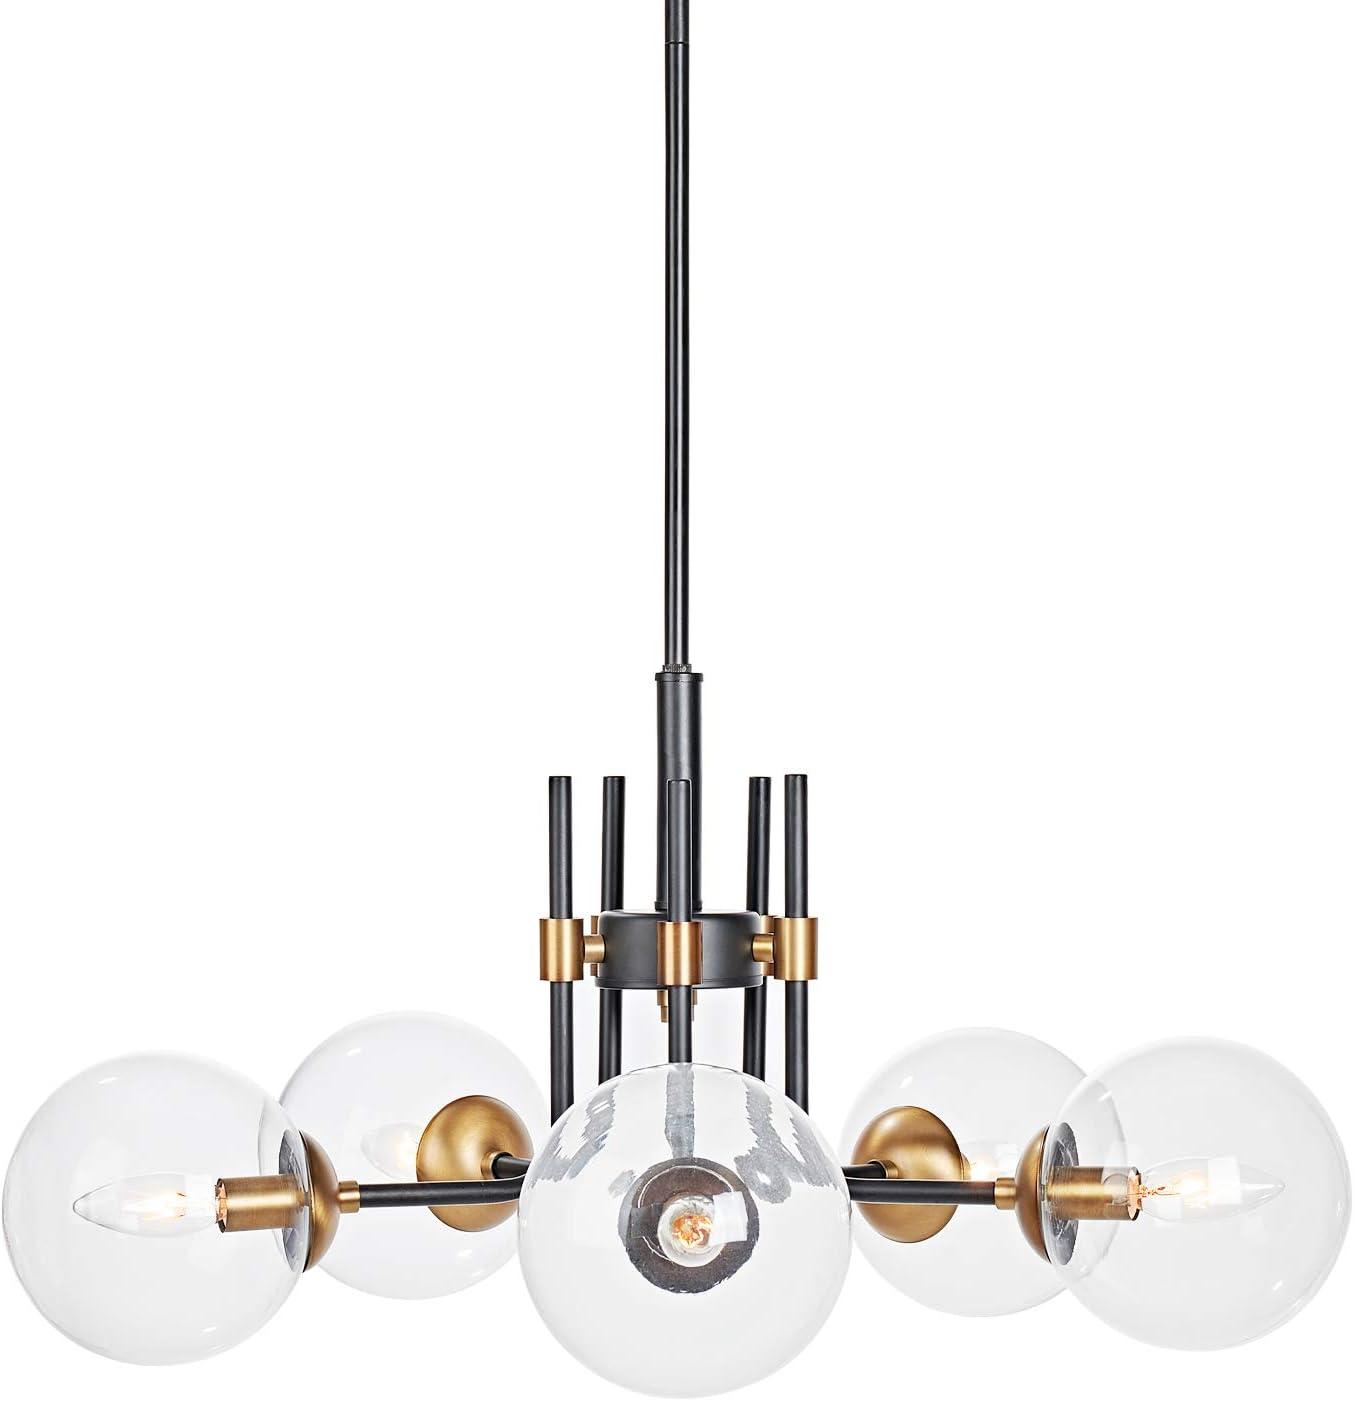 Shop MOTINI 5-Light Sputnik Chandelier from Amazon on Openhaus